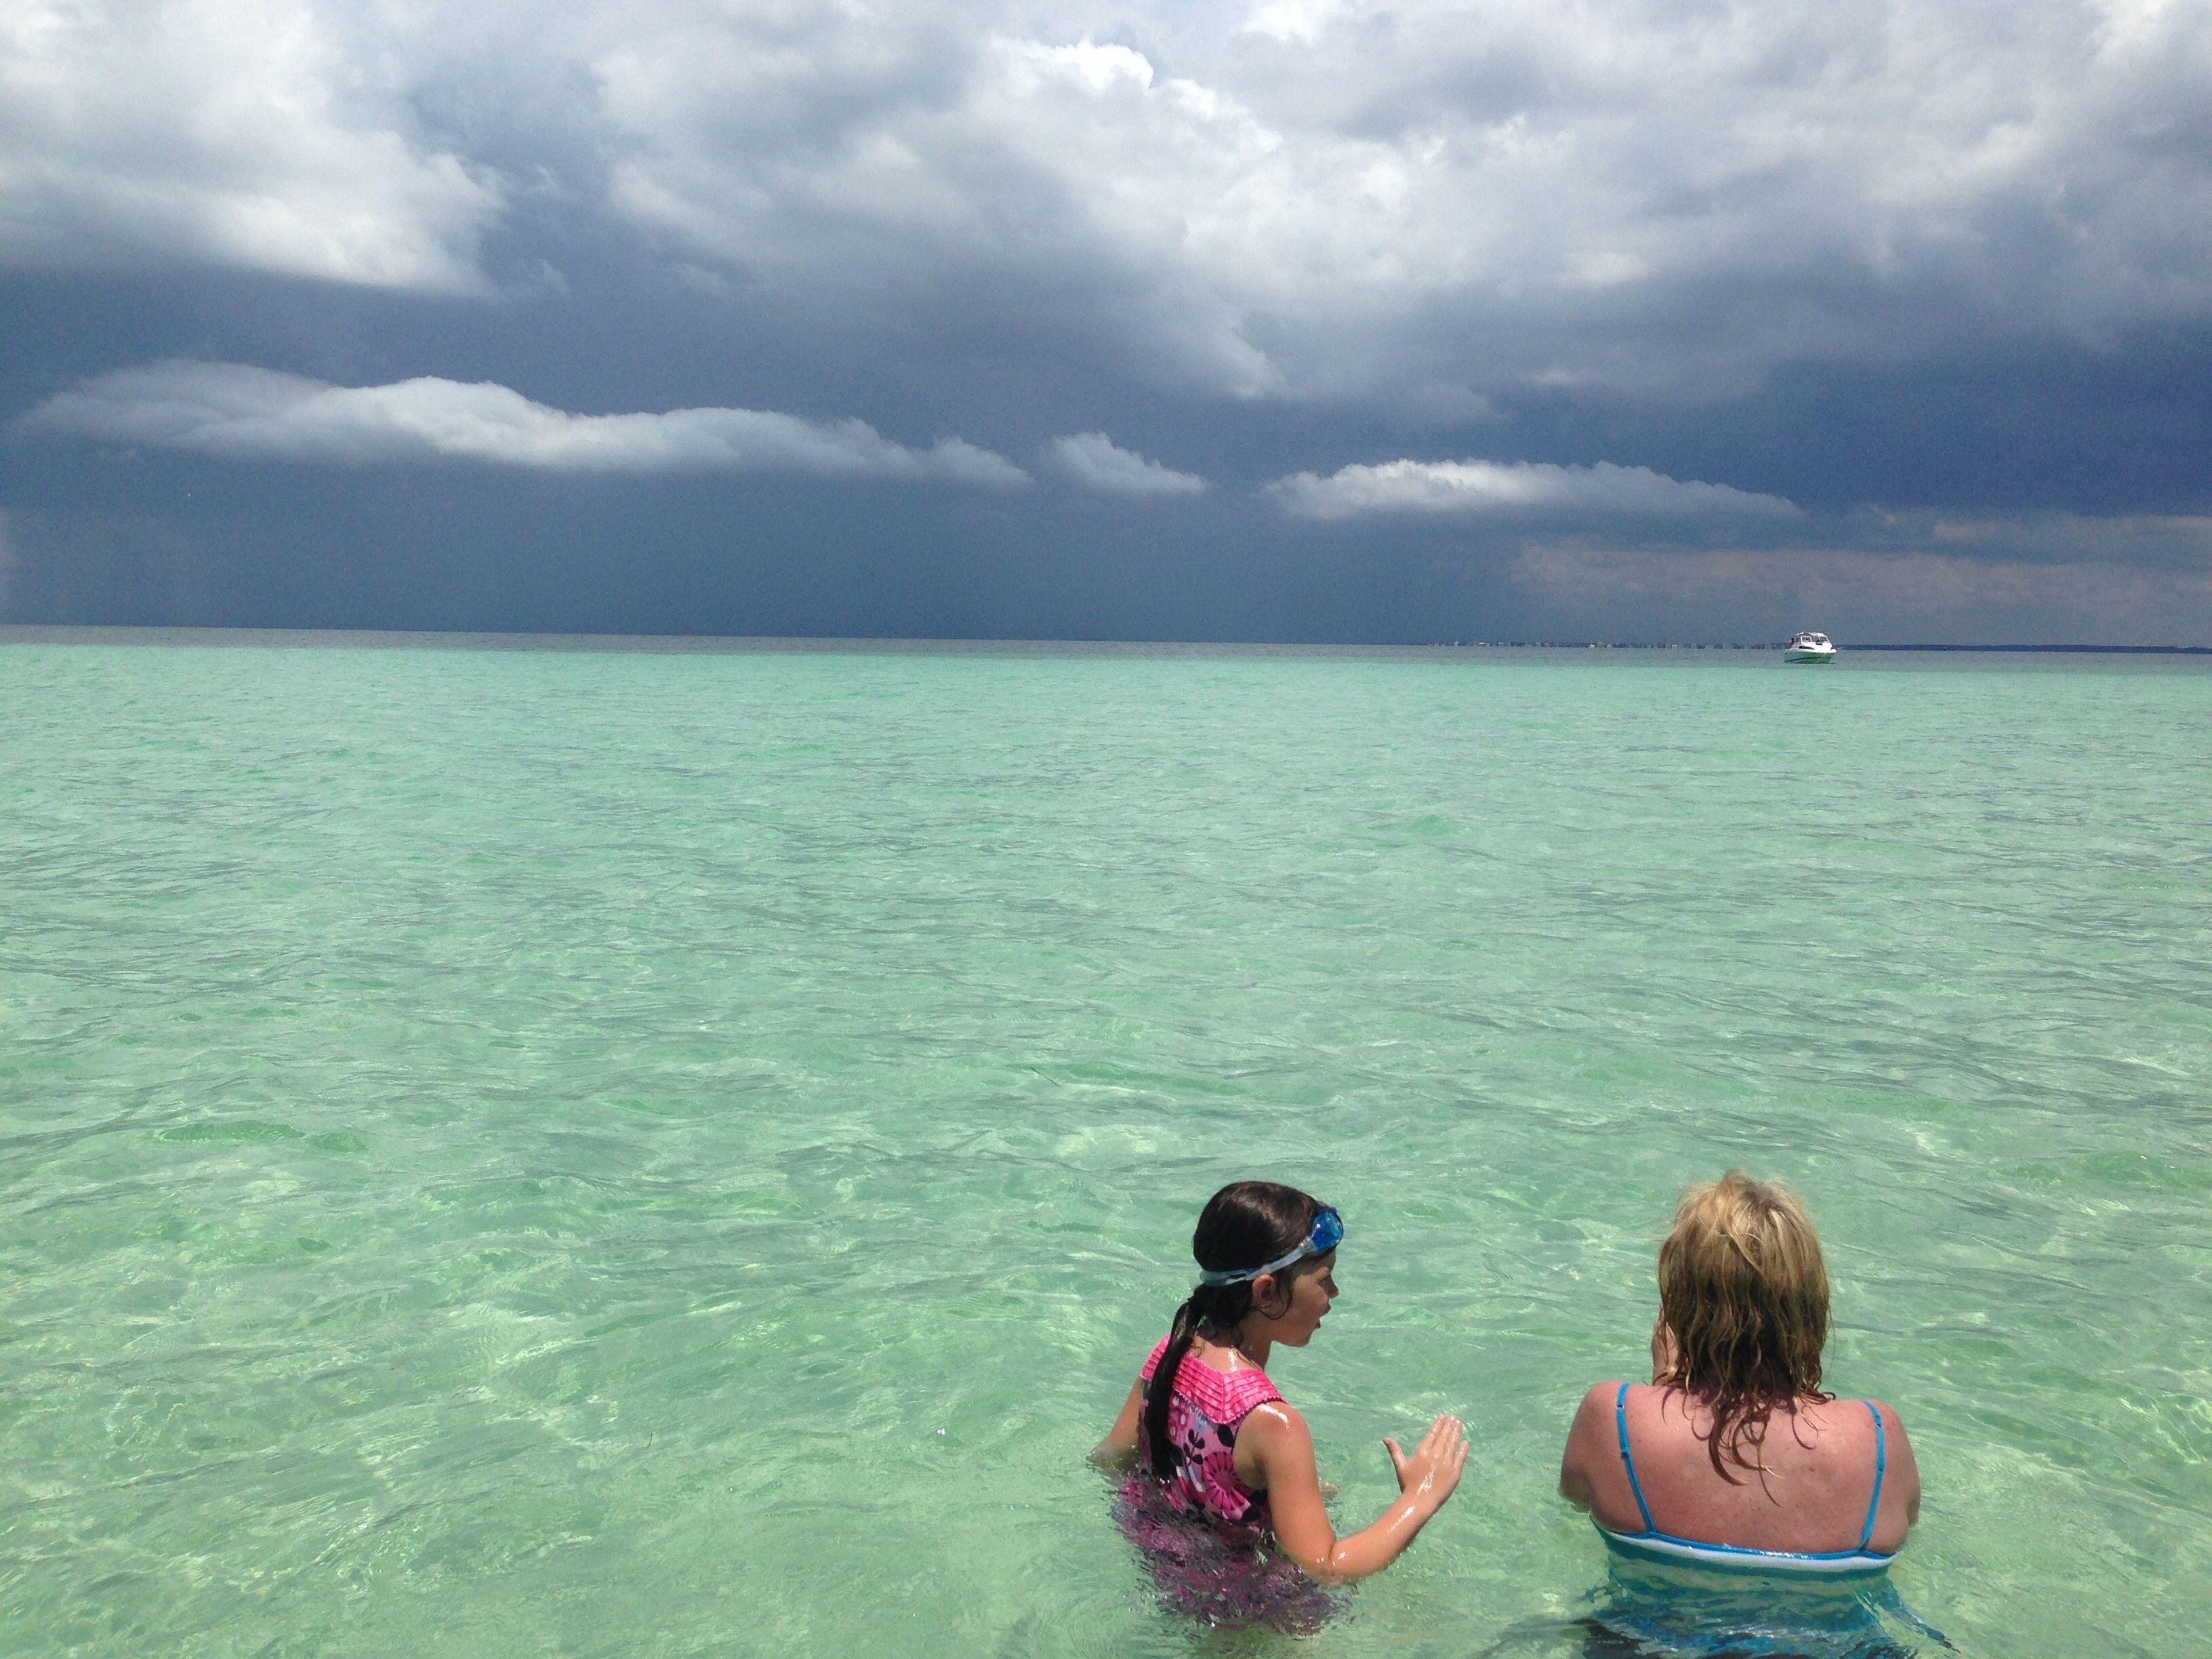 New Port Richey Florida sand bar. Breath taking! | New Port Richey ...